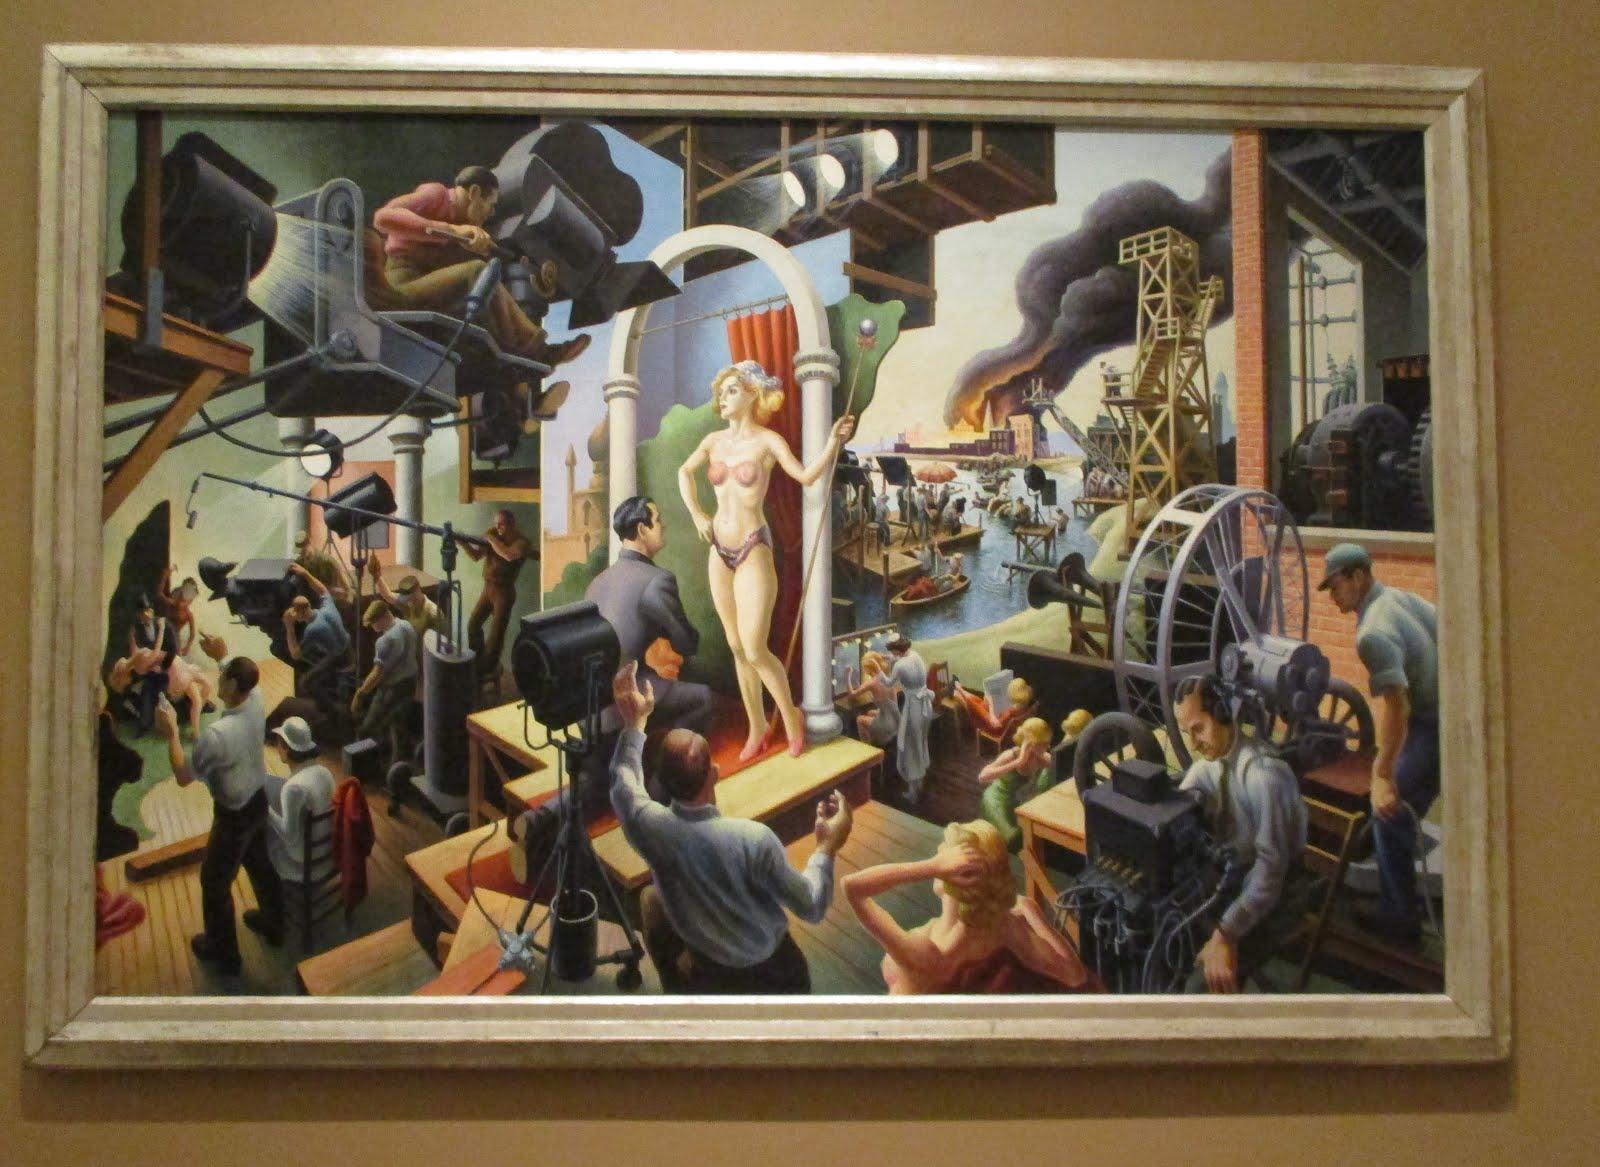 NELSON ATKINS MUSEUM OF ART - KANSAS CITY MISOURRI